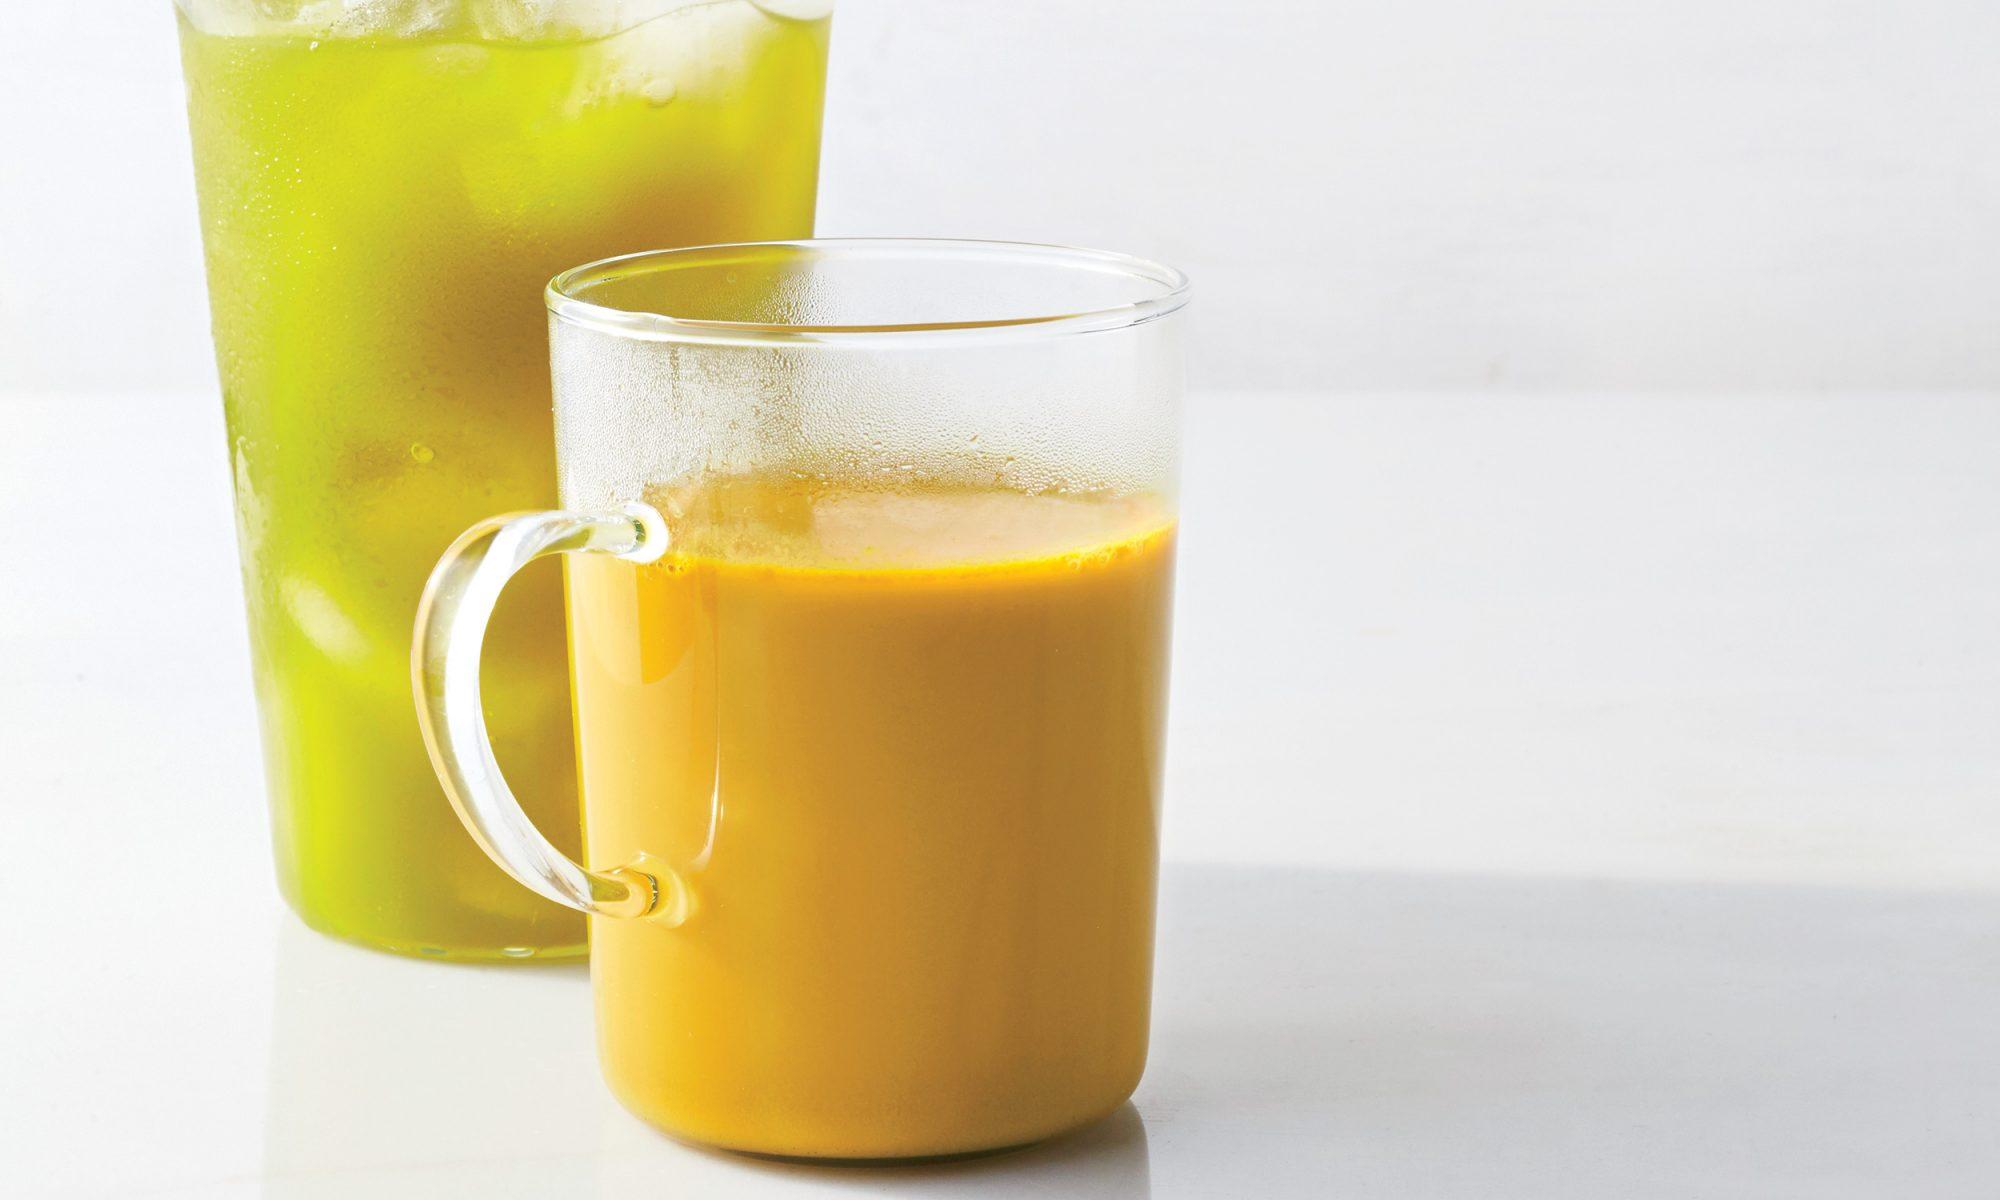 This Coconut Milk and Turmeric Tea Might Make You Smart and Sleepy